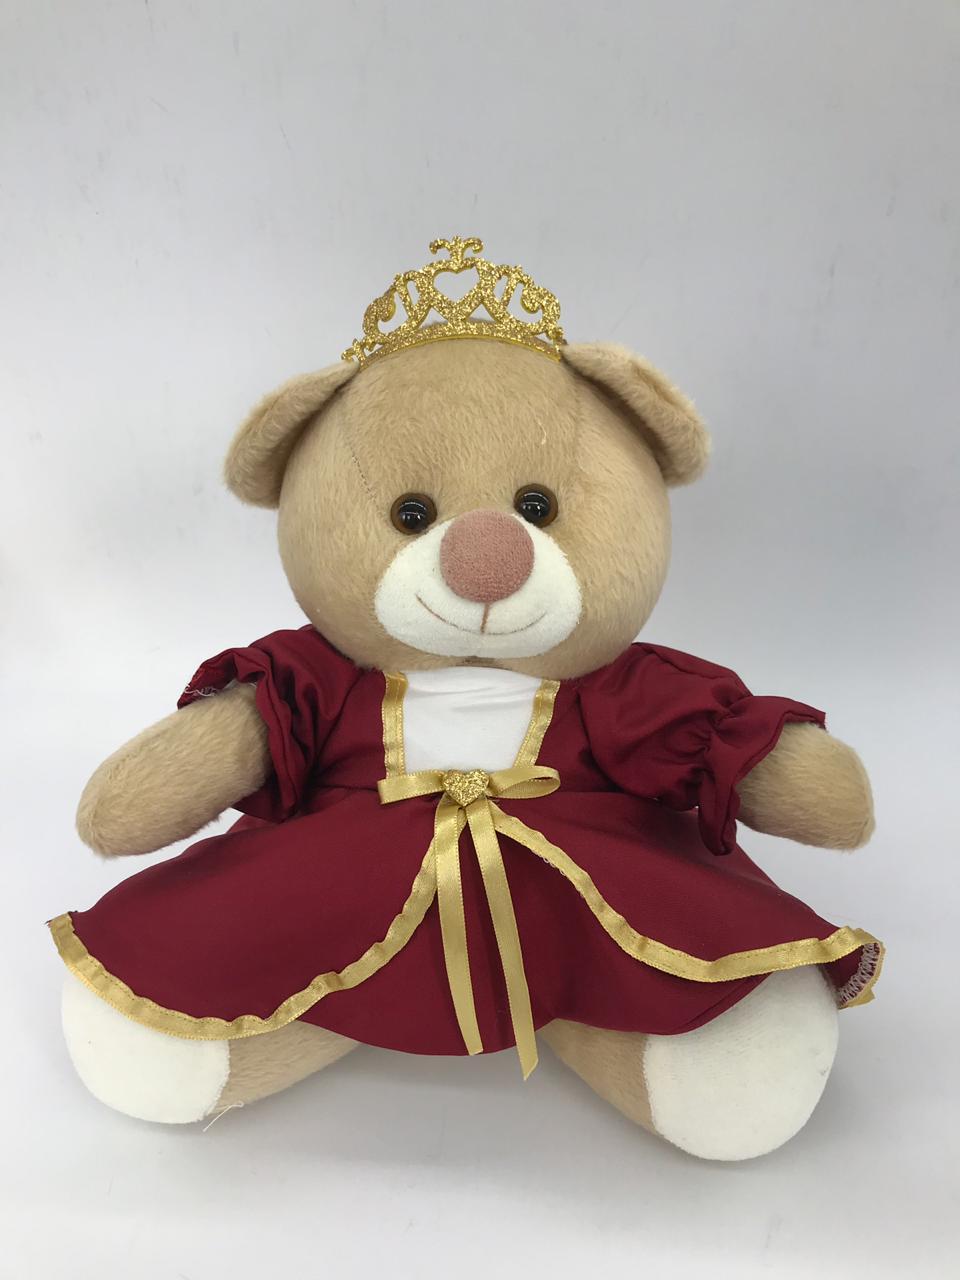 Ursa Teddy Princesa Bordo - Ckd Ref 366 m